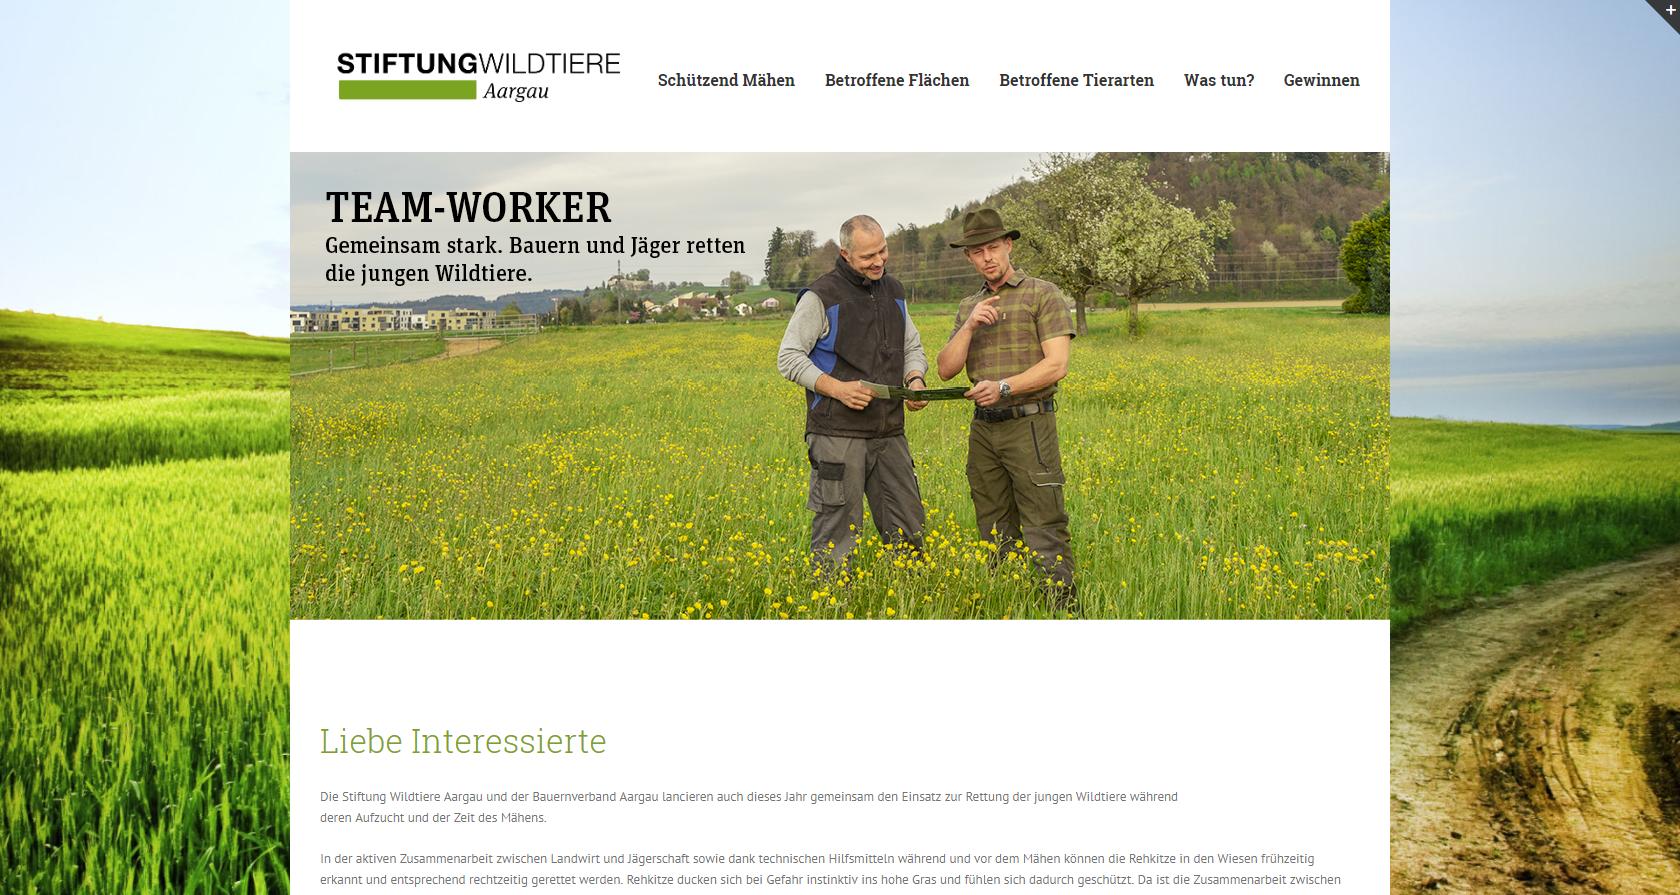 2017 Stiftungwildtiere.ch - Wordpress